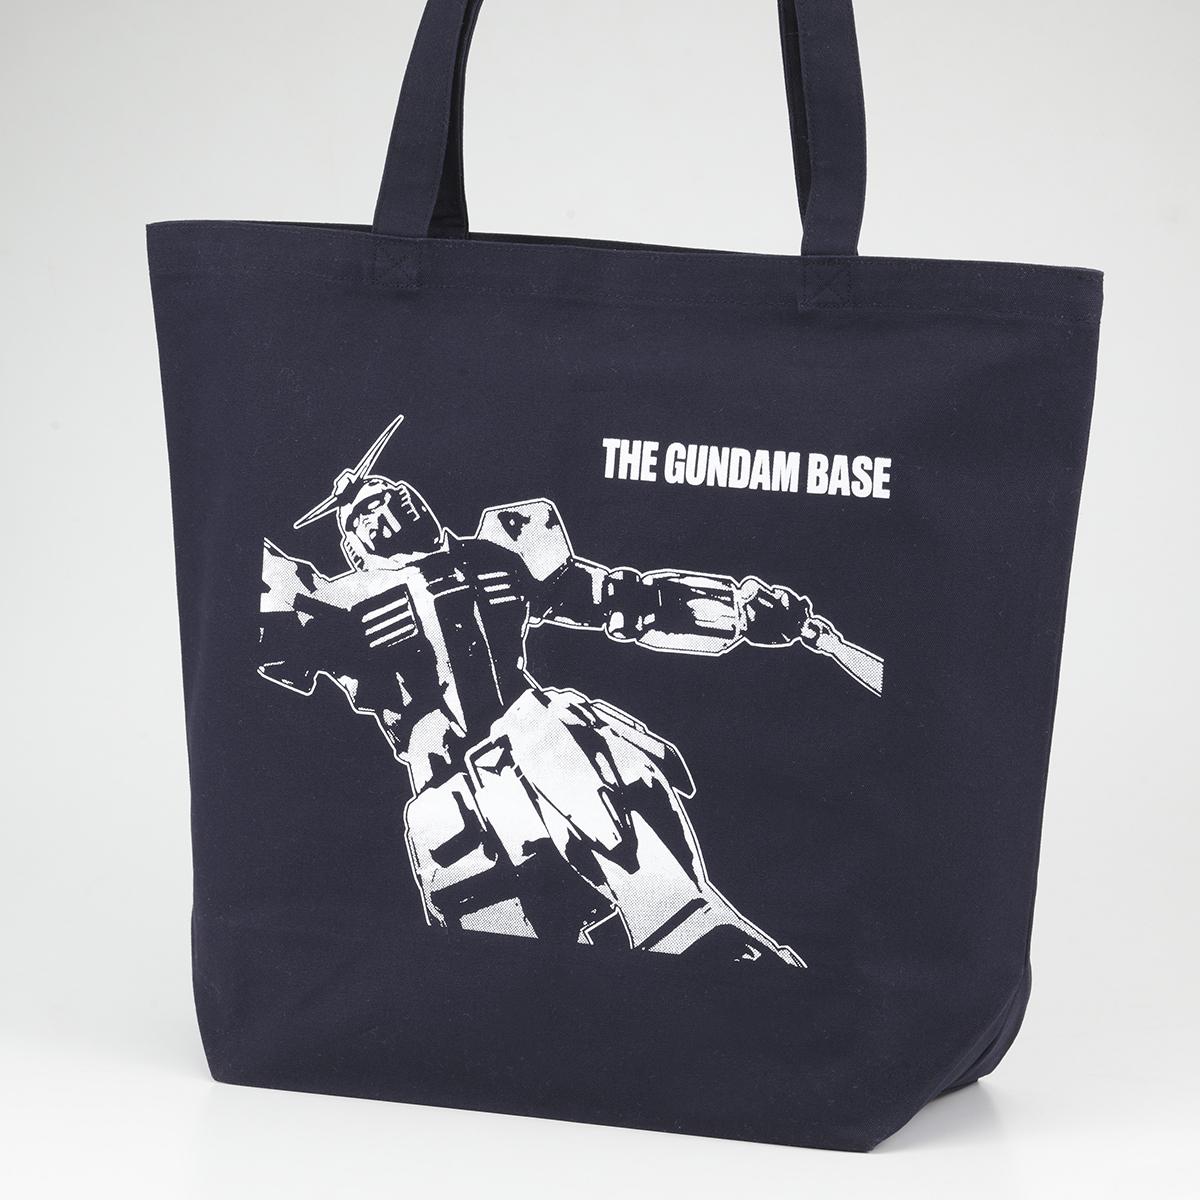 THE GUNDAM BASE トートバック